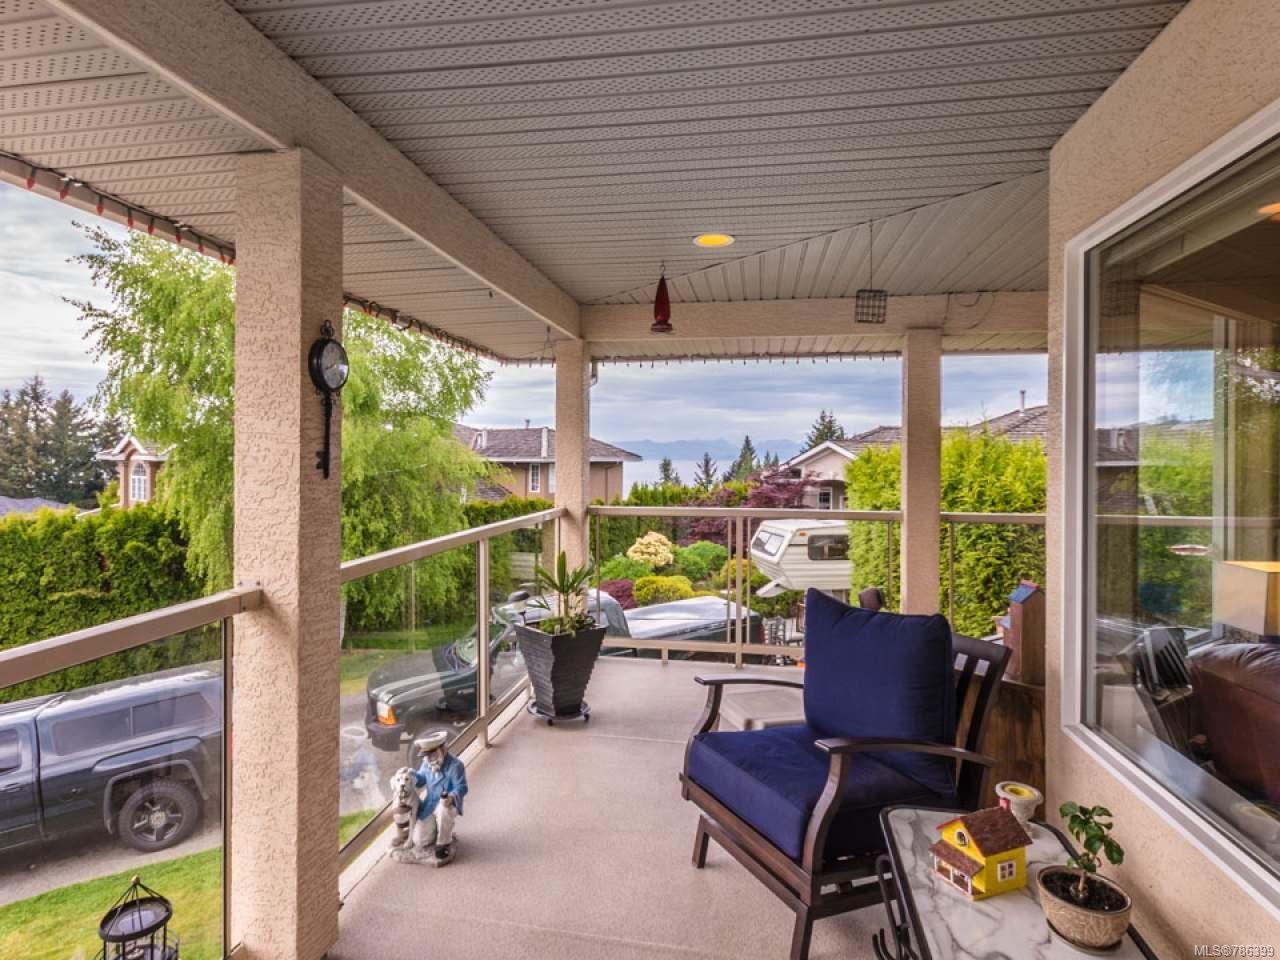 Photo 13: Photos: 5371 HIGHRIDGE PLACE in NANAIMO: Na North Nanaimo House for sale (Nanaimo)  : MLS®# 786399